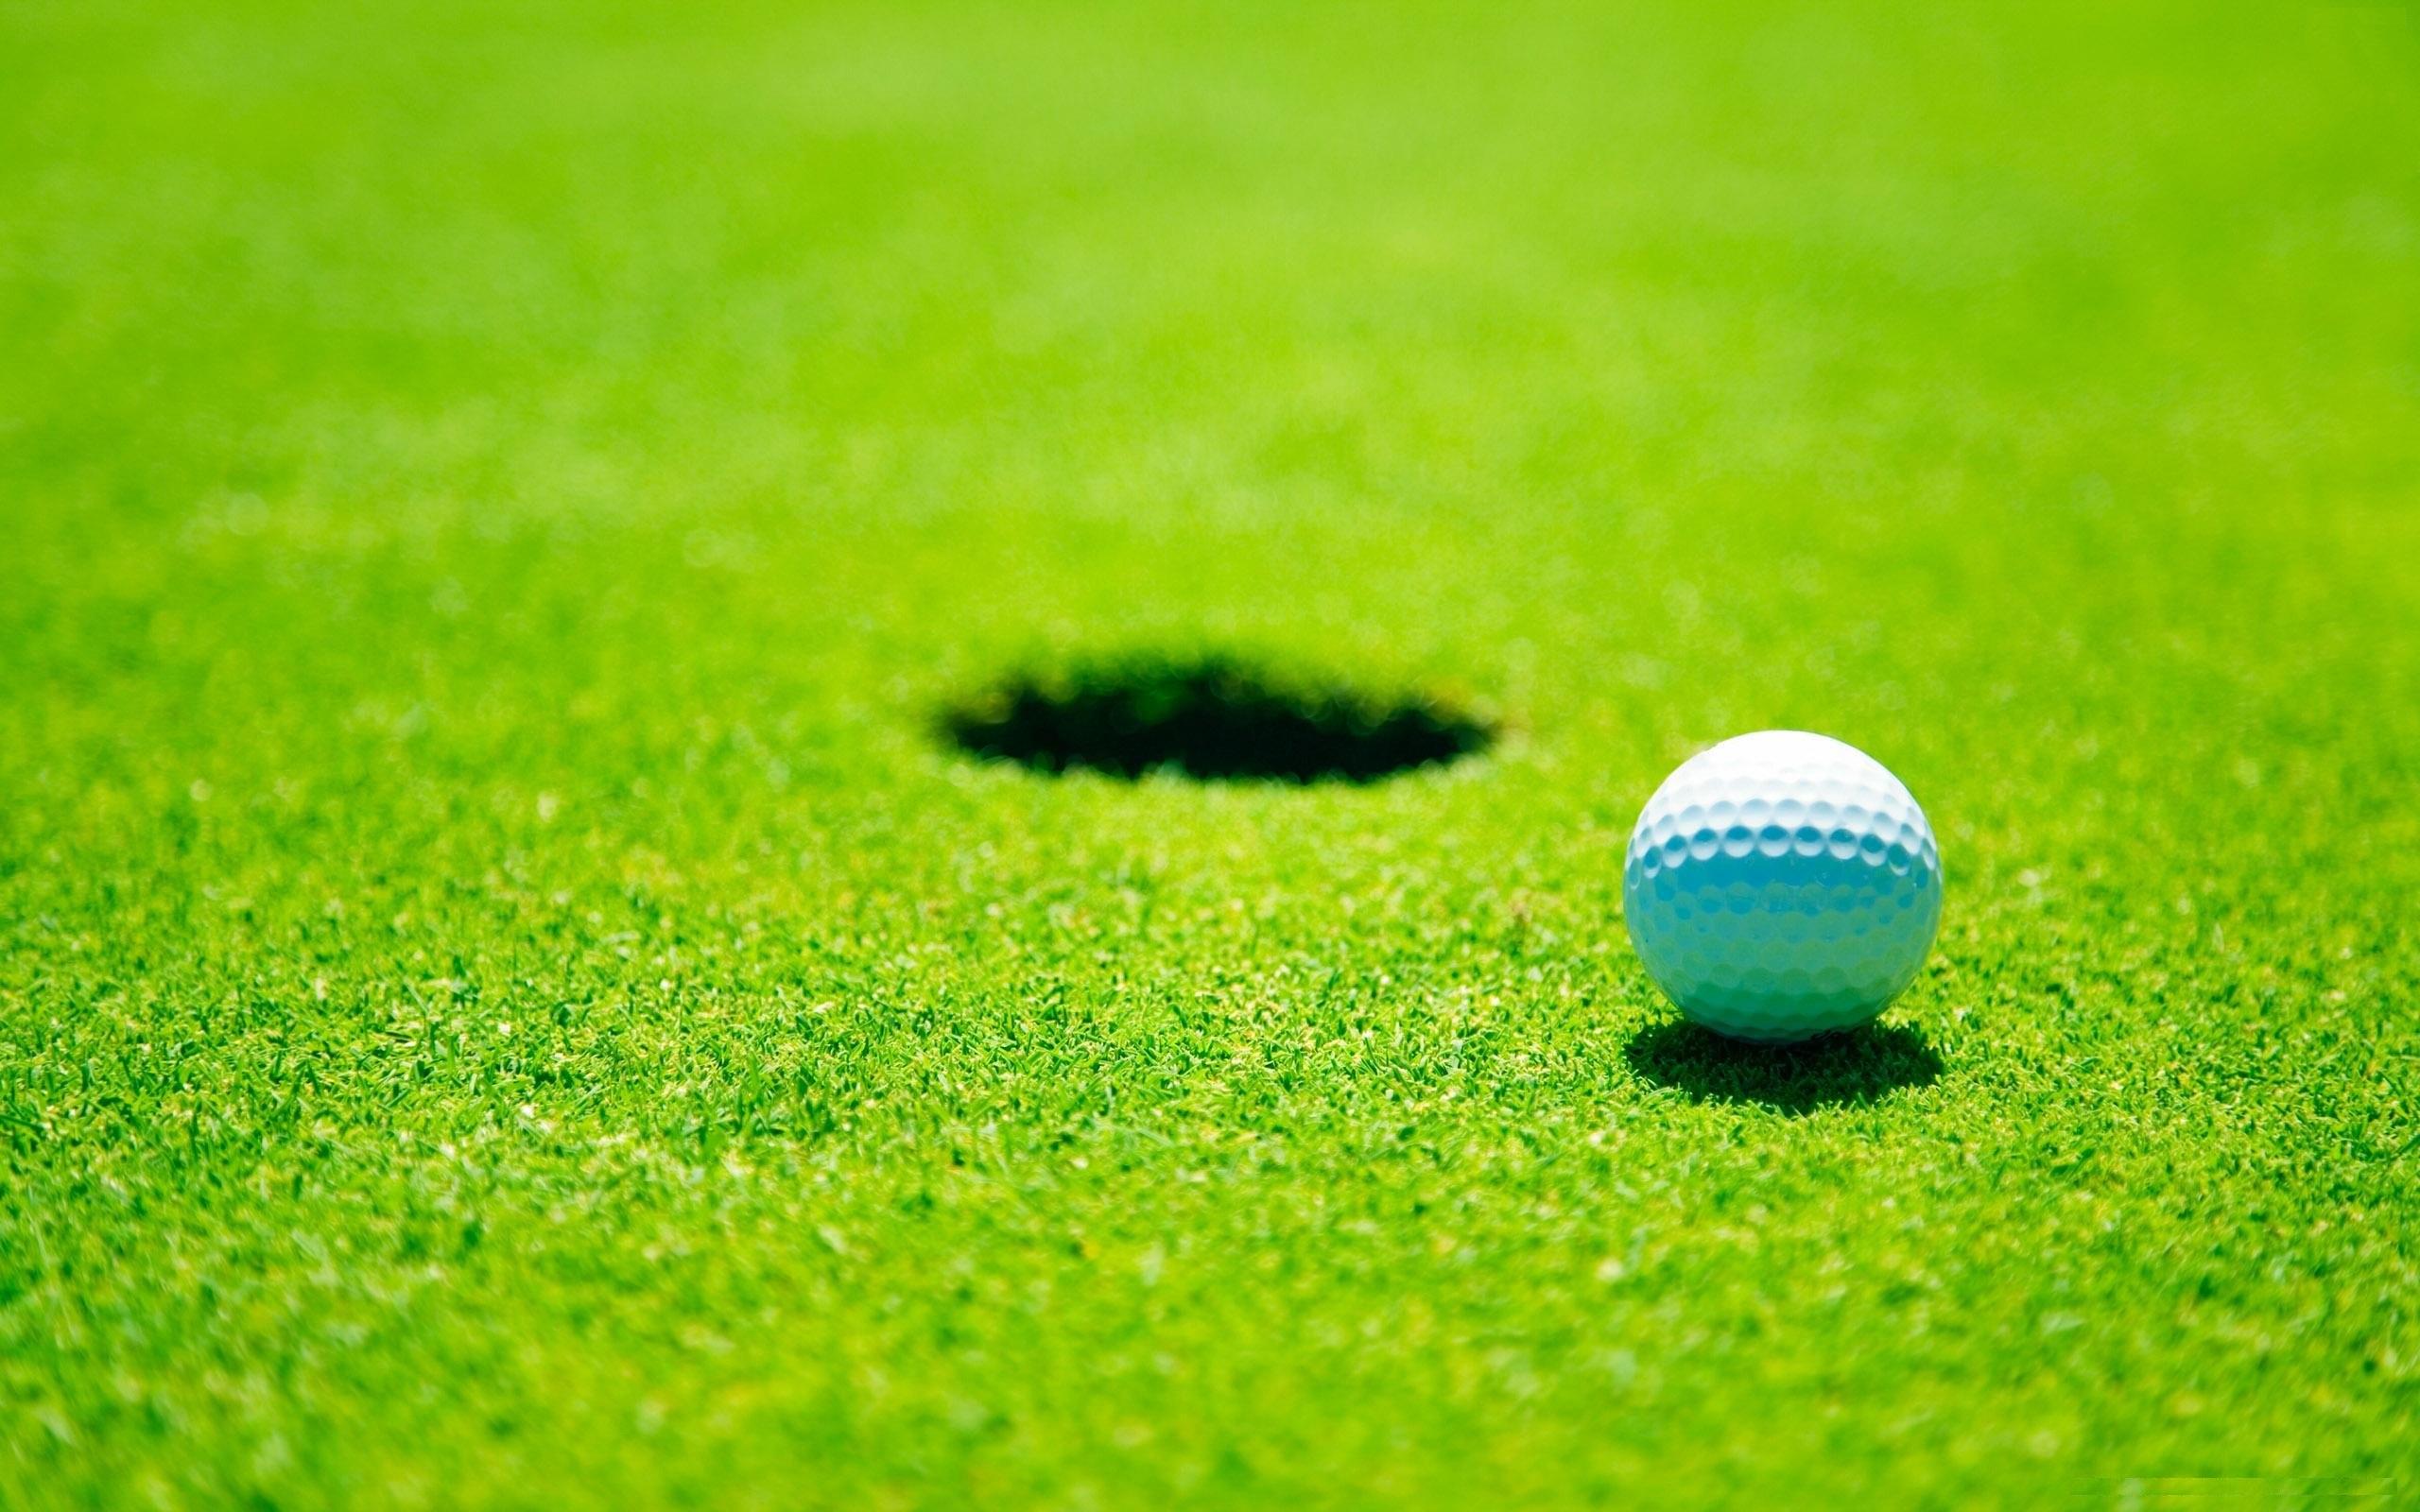 Golf Hd Photo